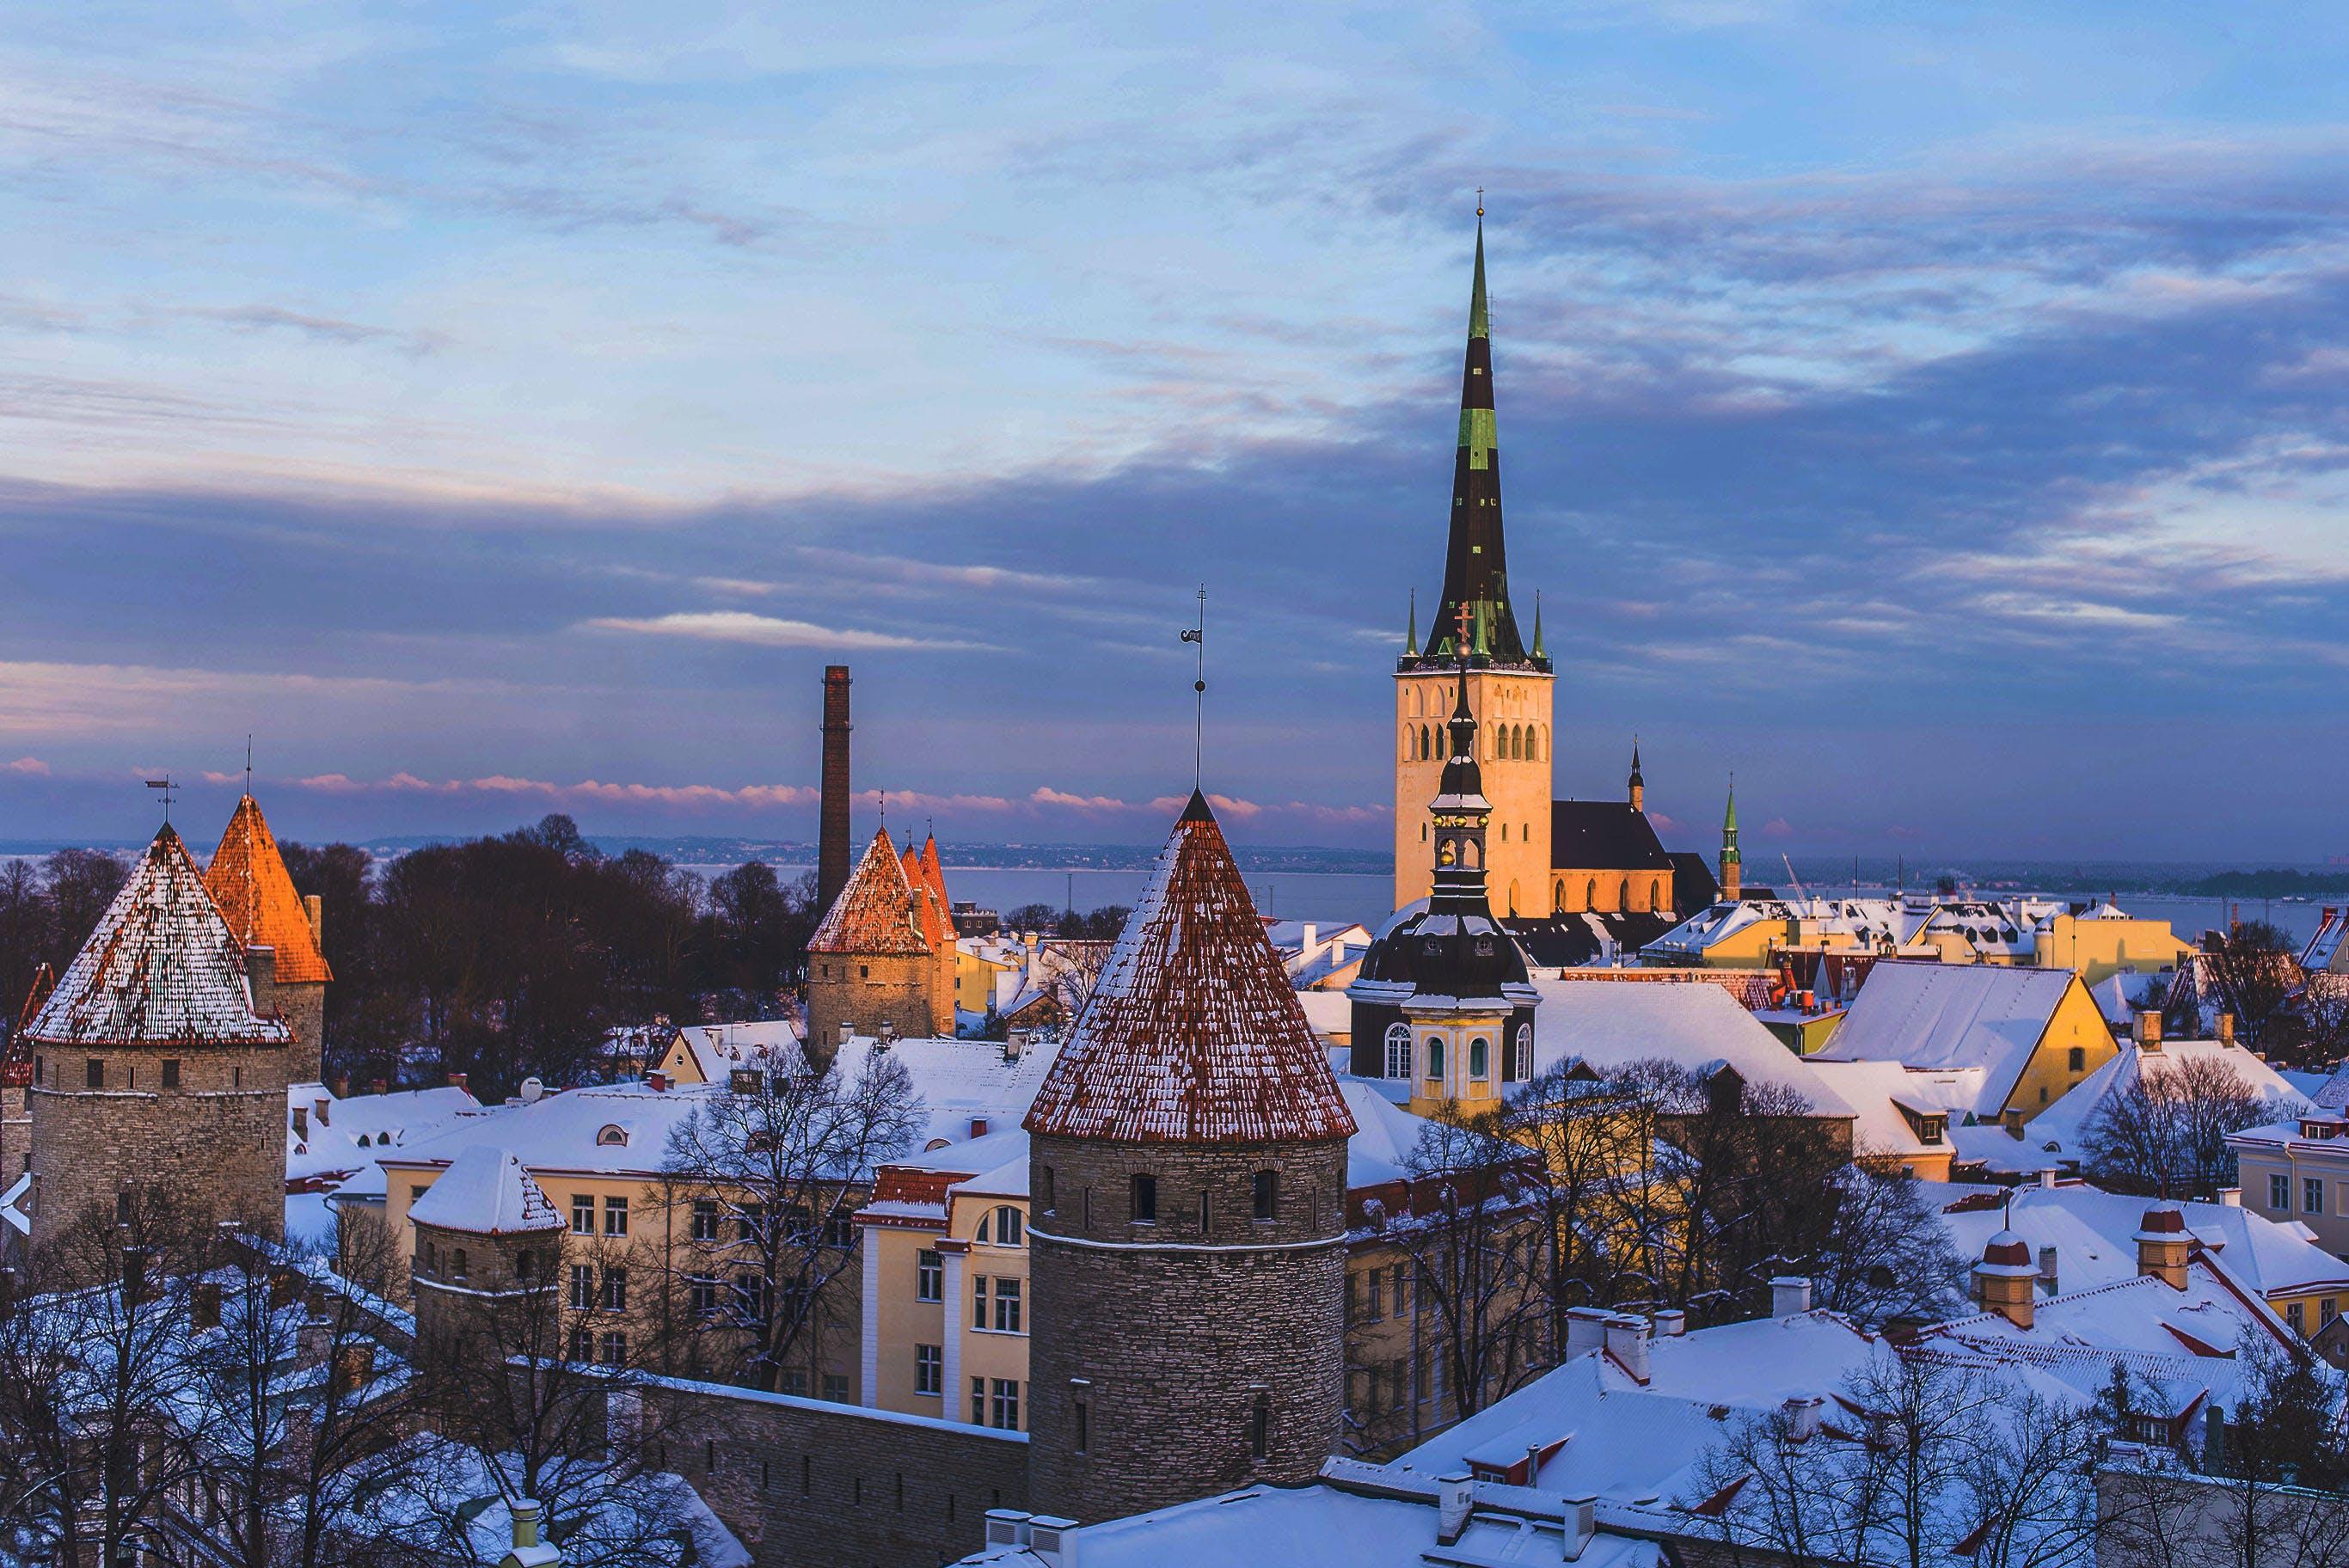 Picture of Tallinn, Estonia.